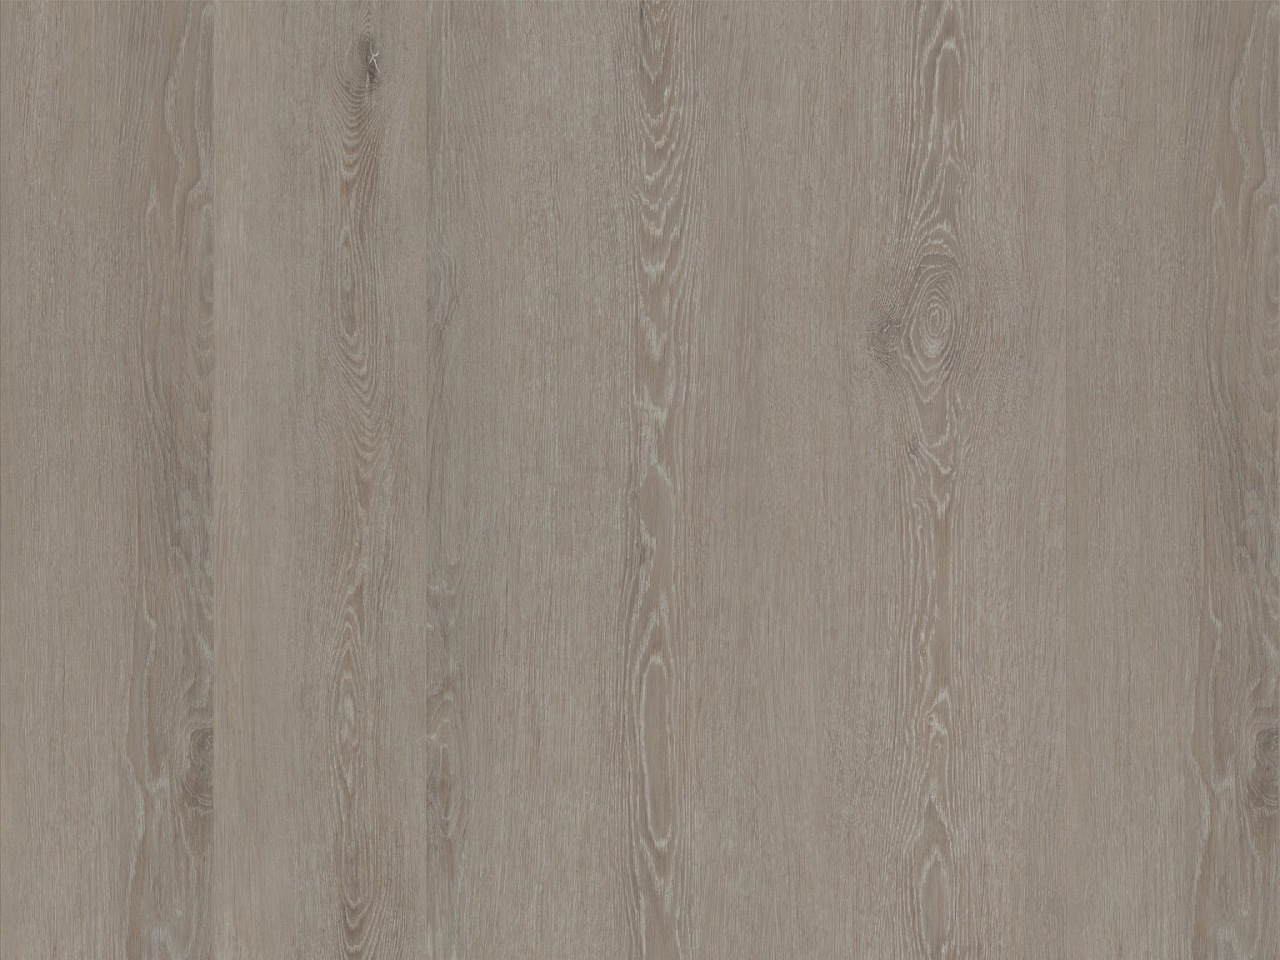 Designbelag Alesso wood – Eiche Namur, 324004